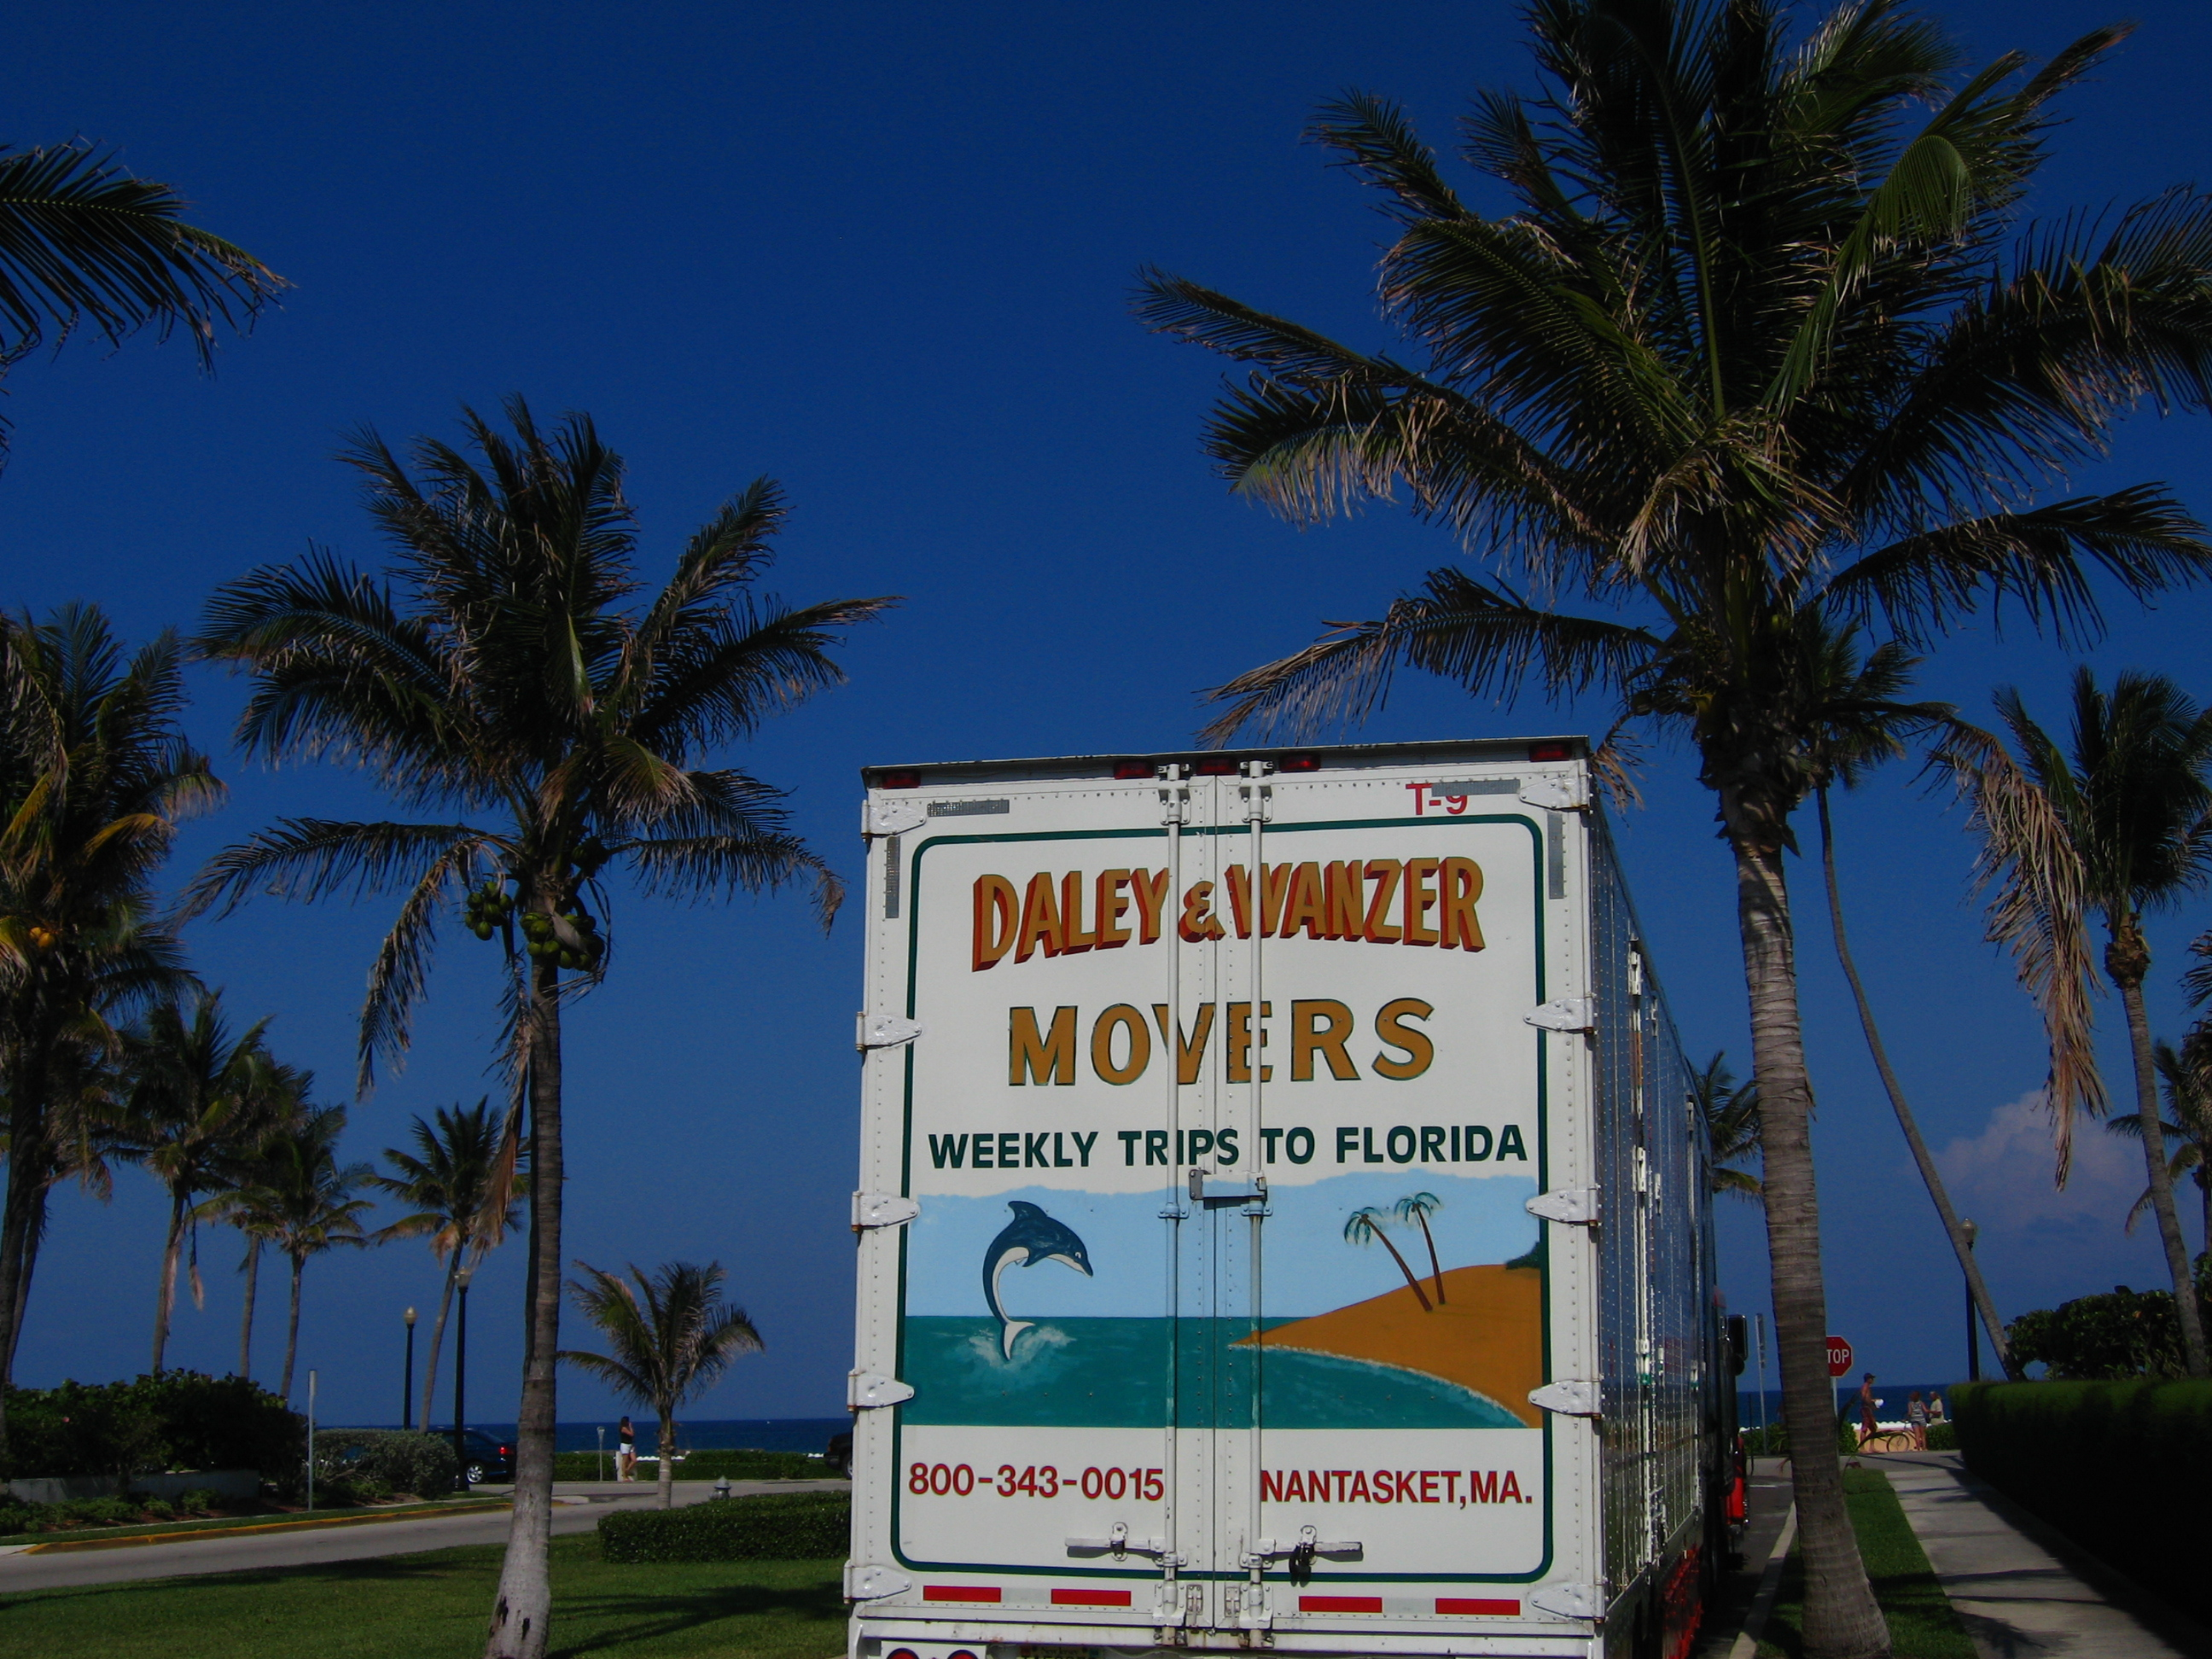 Moving Van, West Palm Beach, Florida